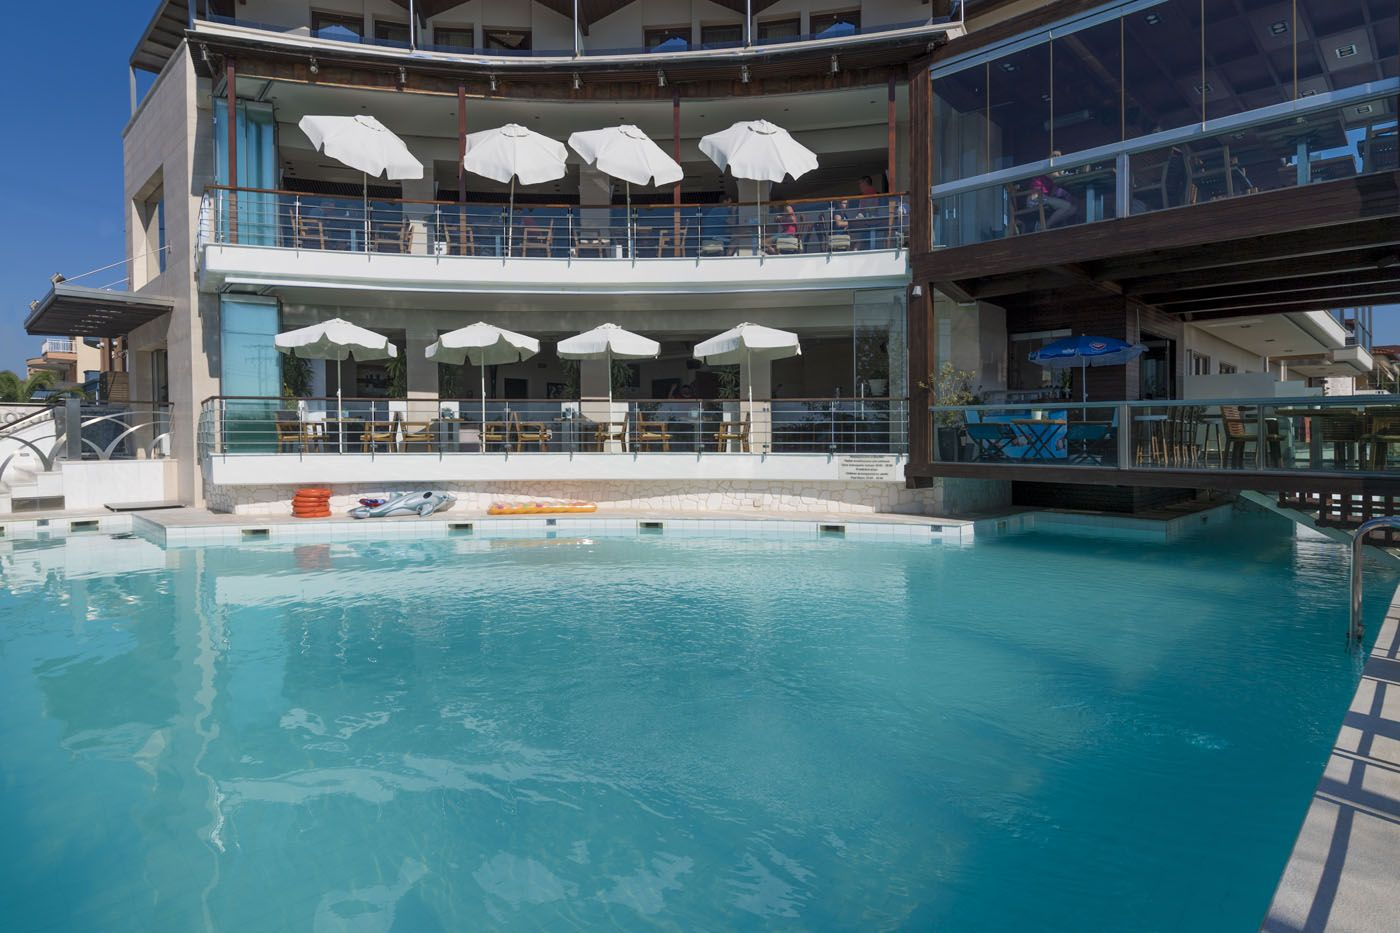 cosmo piscina.jpg